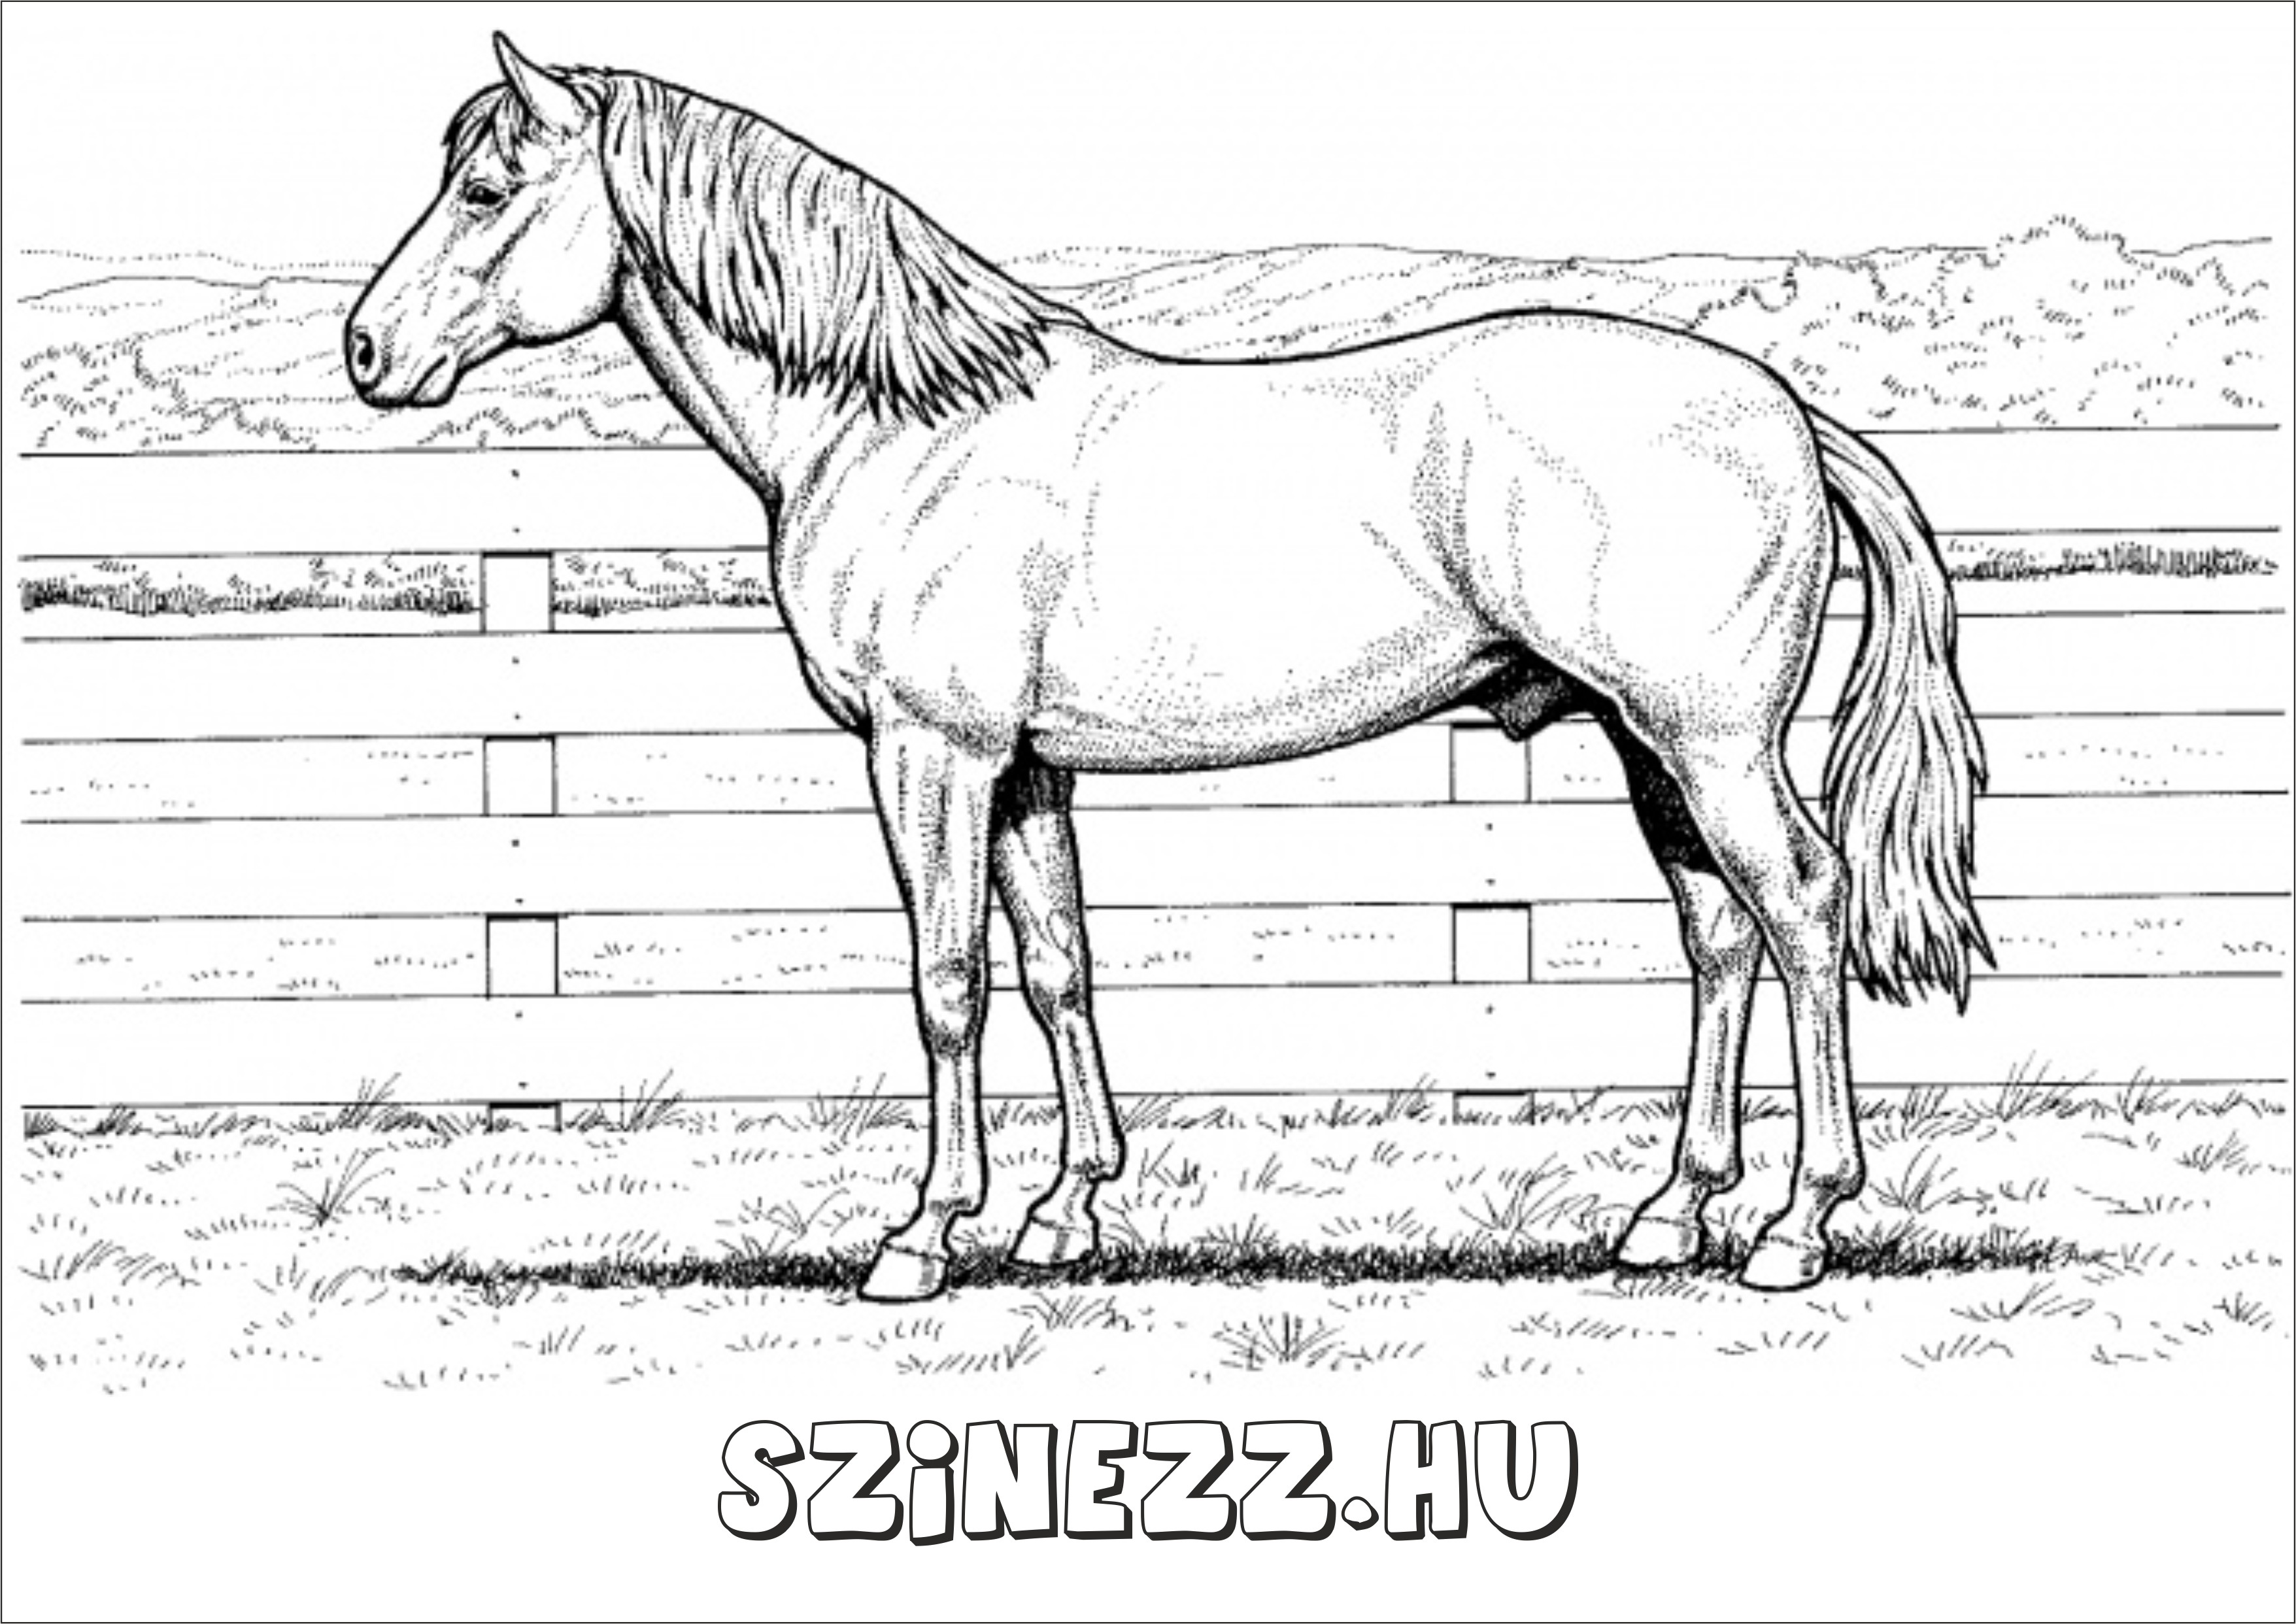 lovas kifestő, lovas színező póni kifestő, én kicsi pónim színező, lovas színező pegazus, unikornis